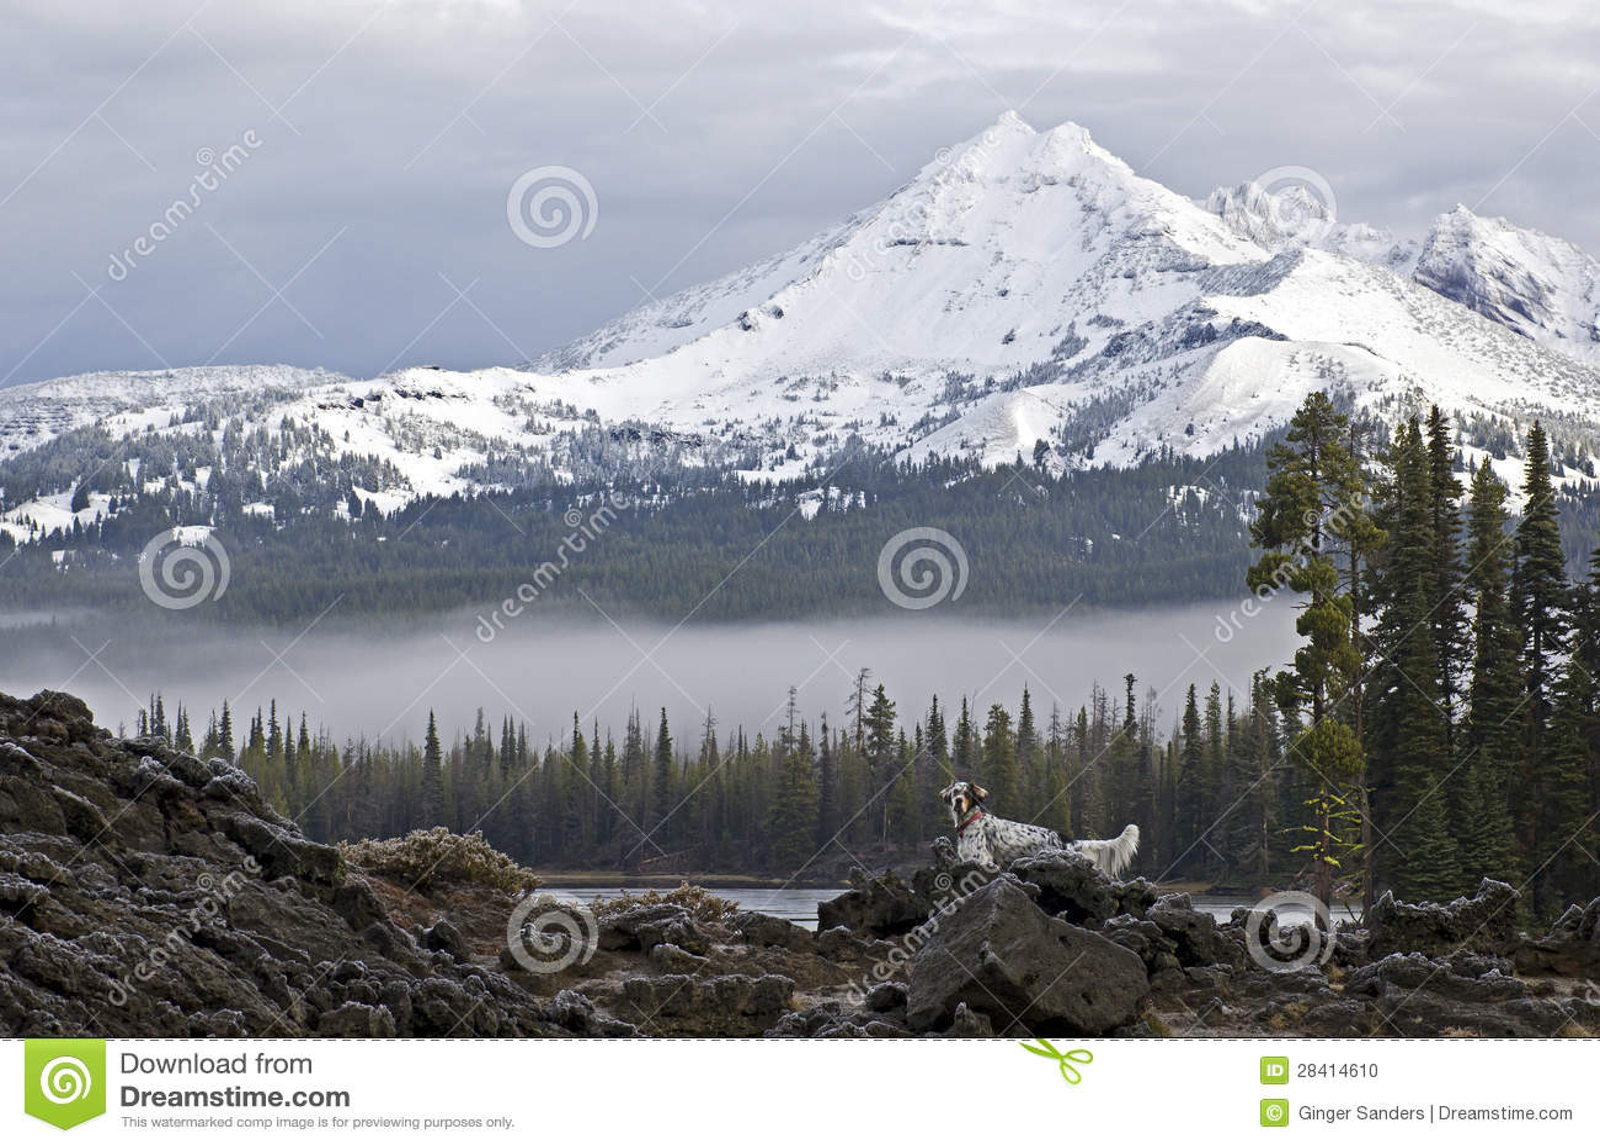 Сокол в горах птица природа картинки